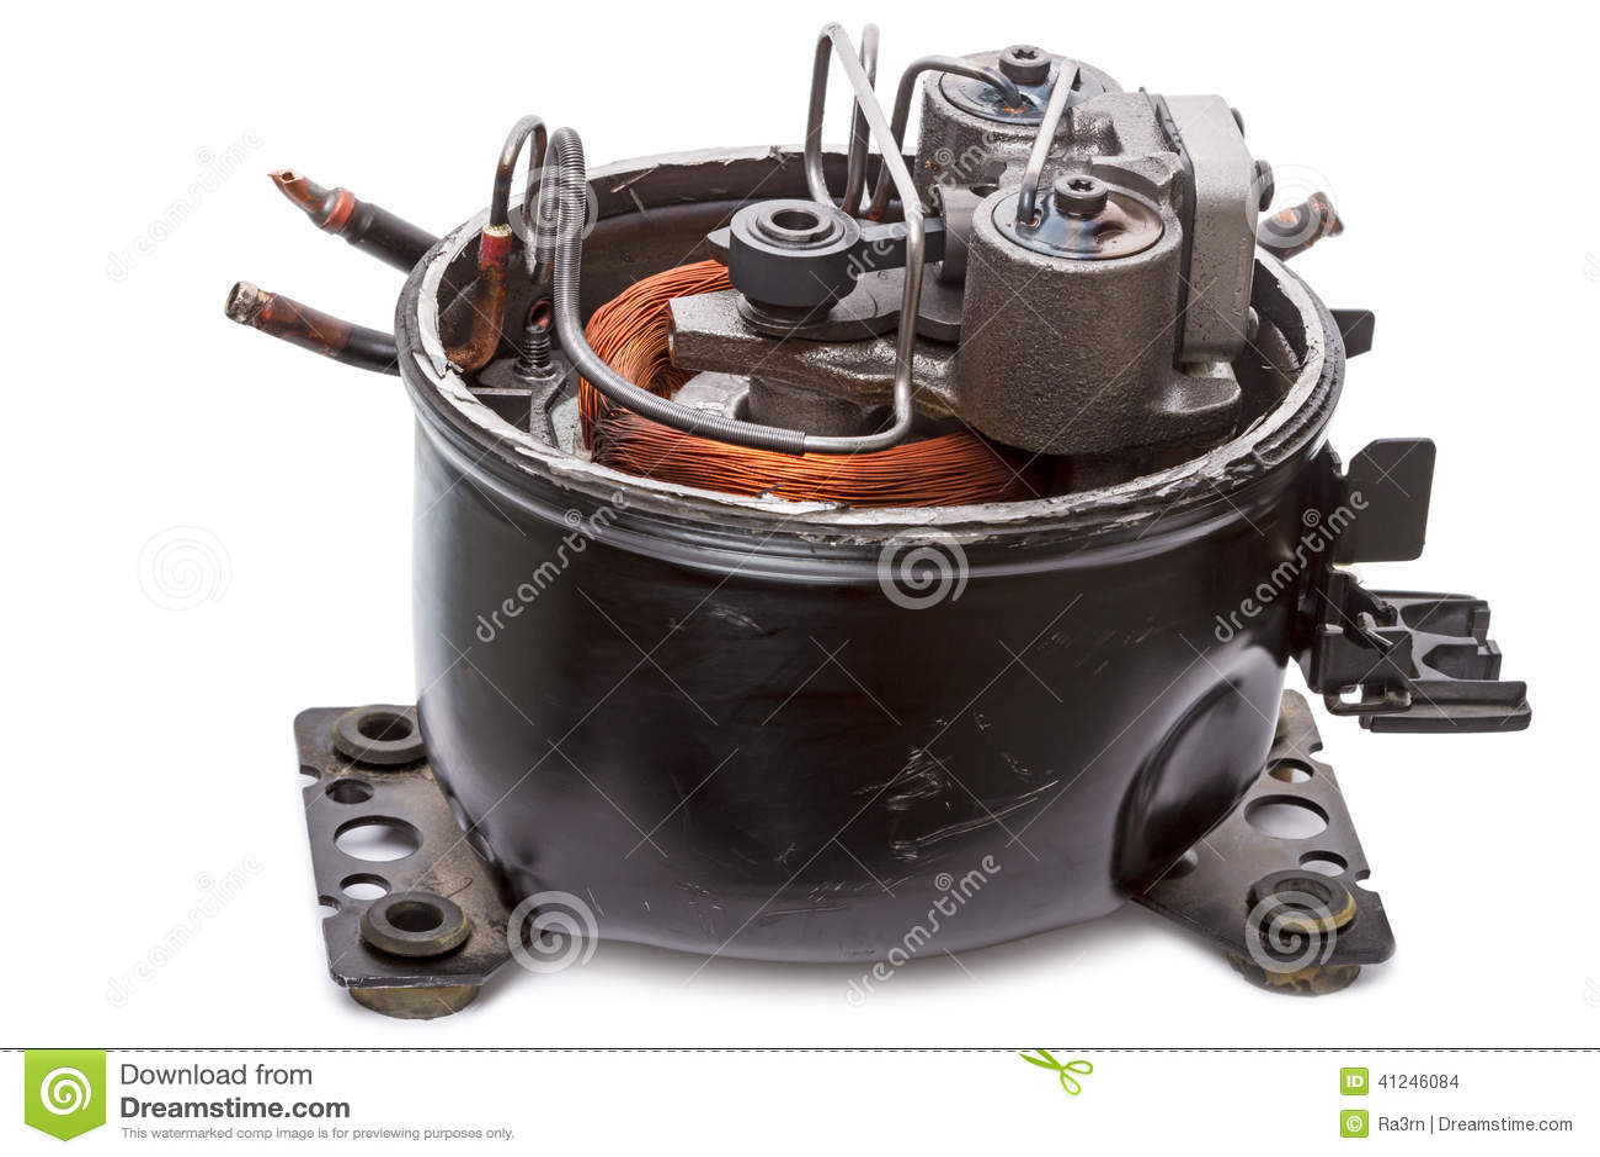 Repair refrigerator compressor stock photo image of for Max motor dreams cost